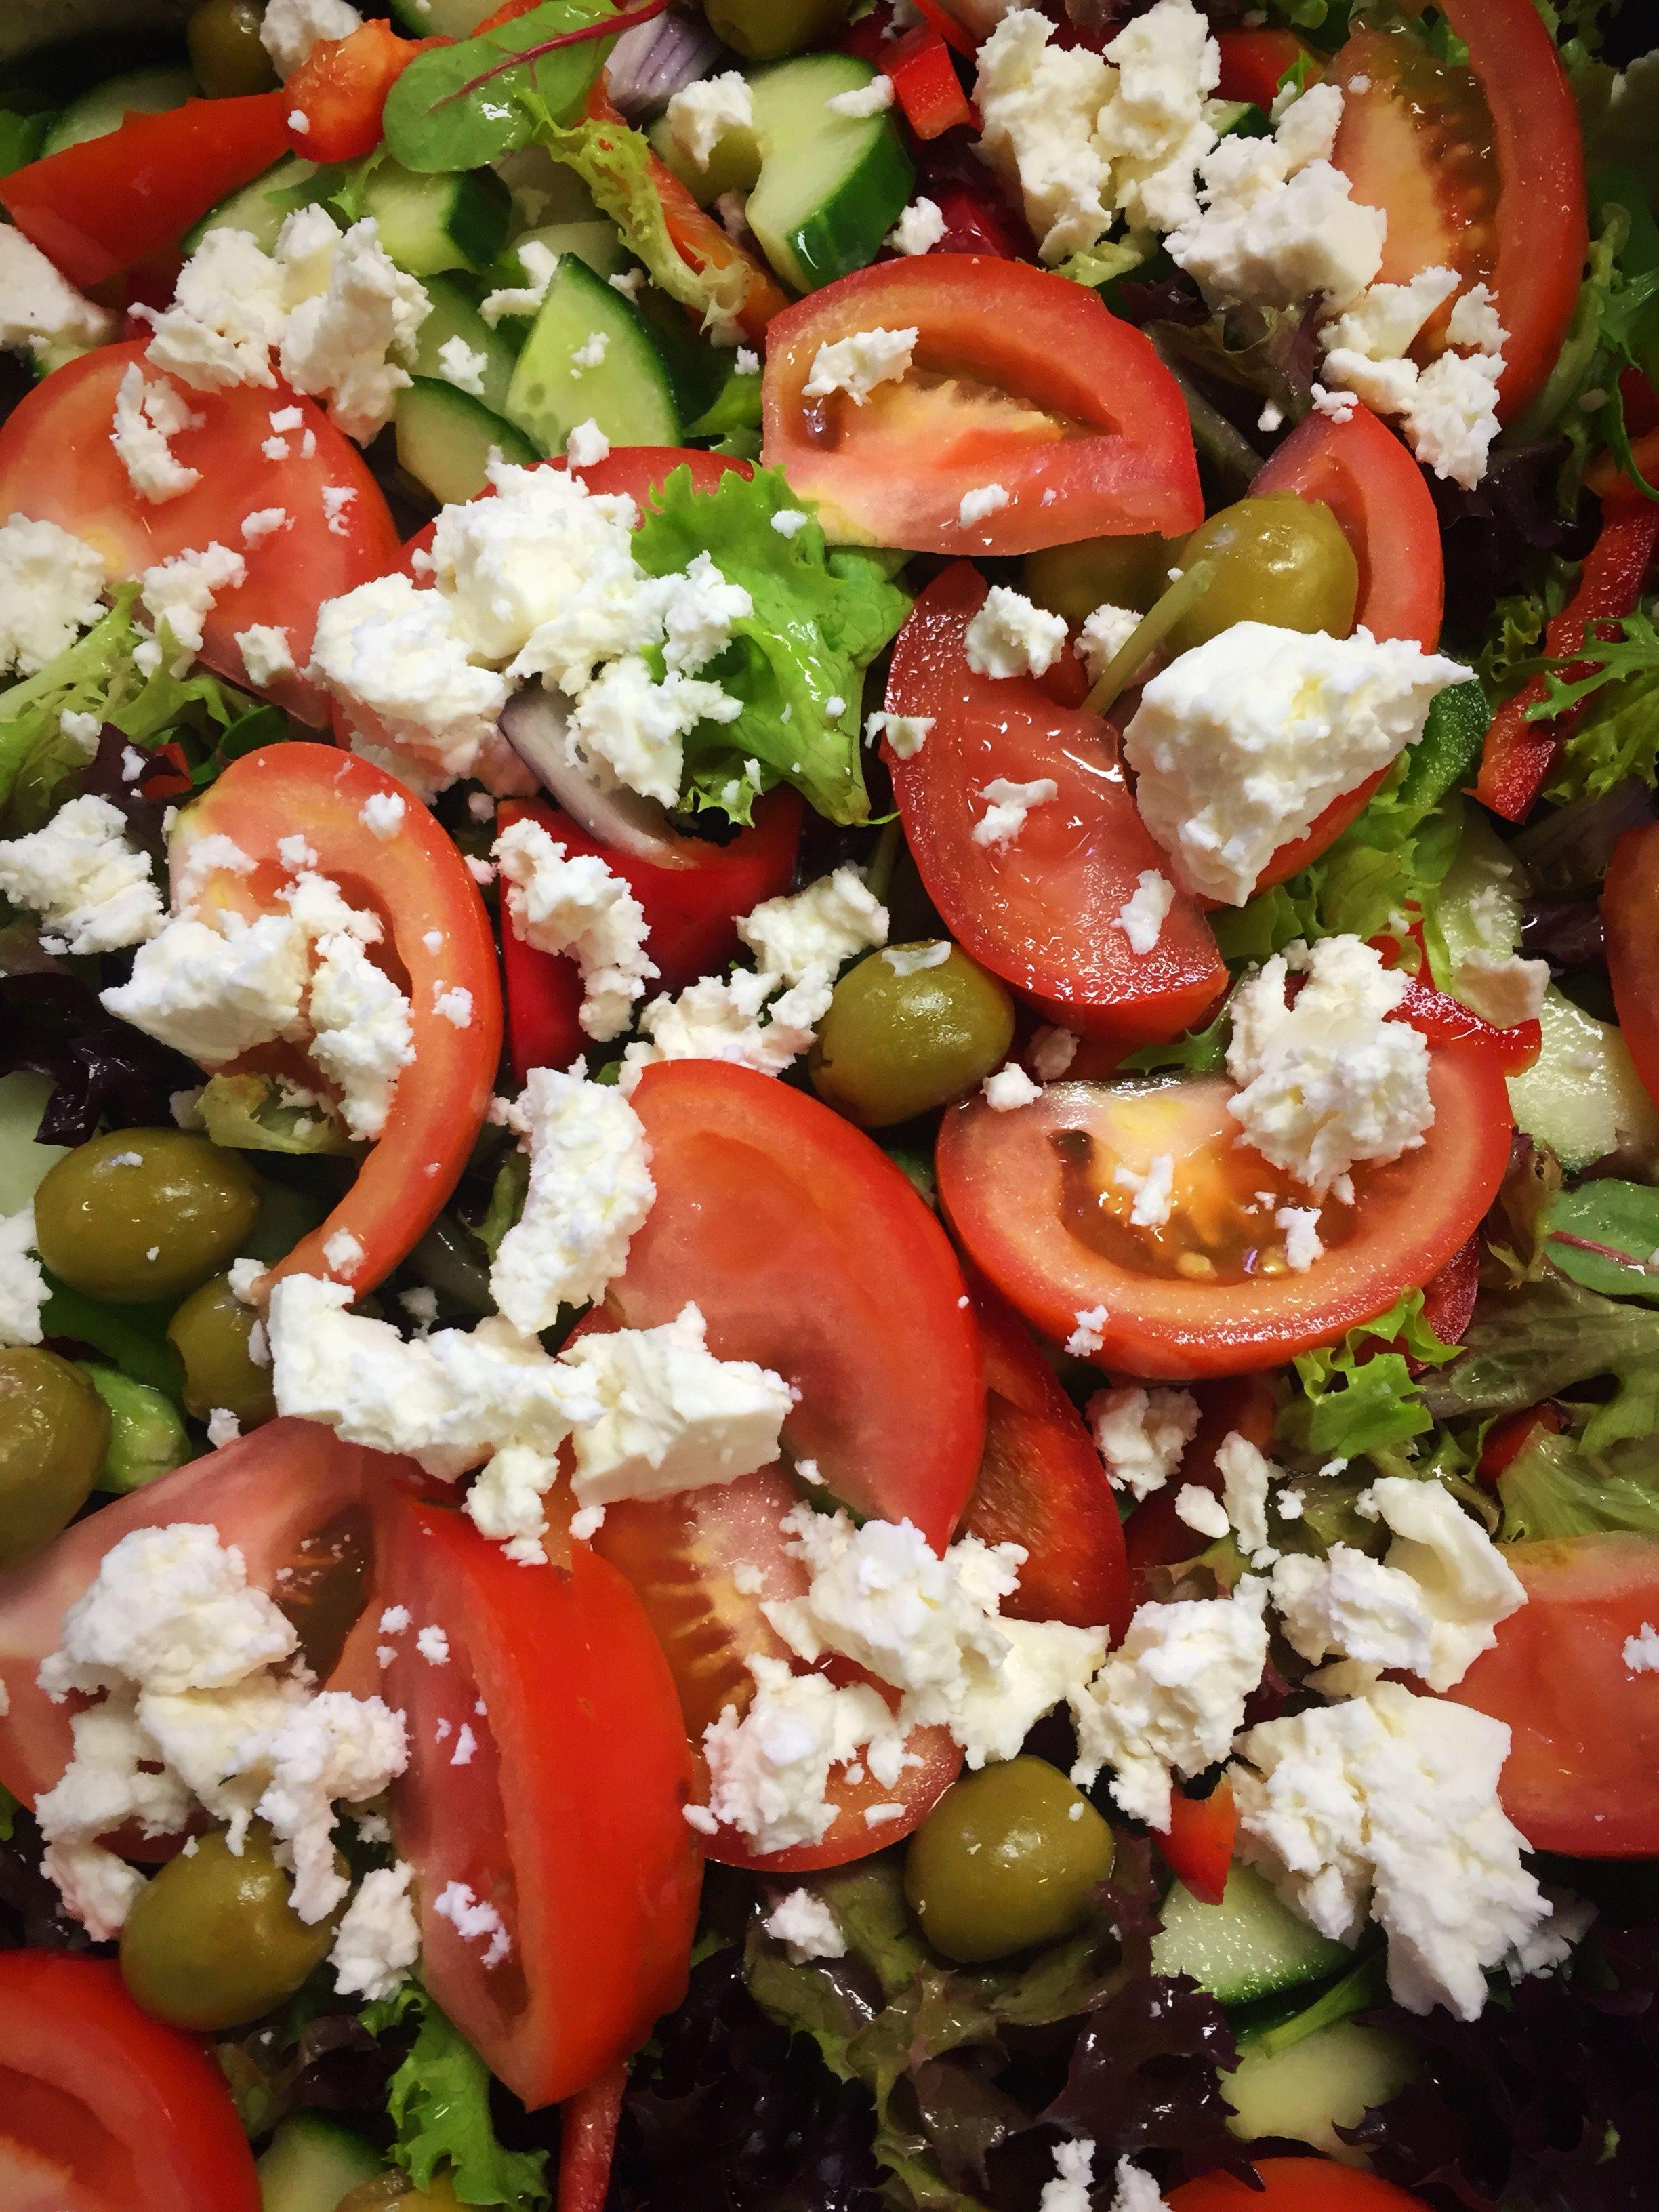 Mediterranean salad at HGC